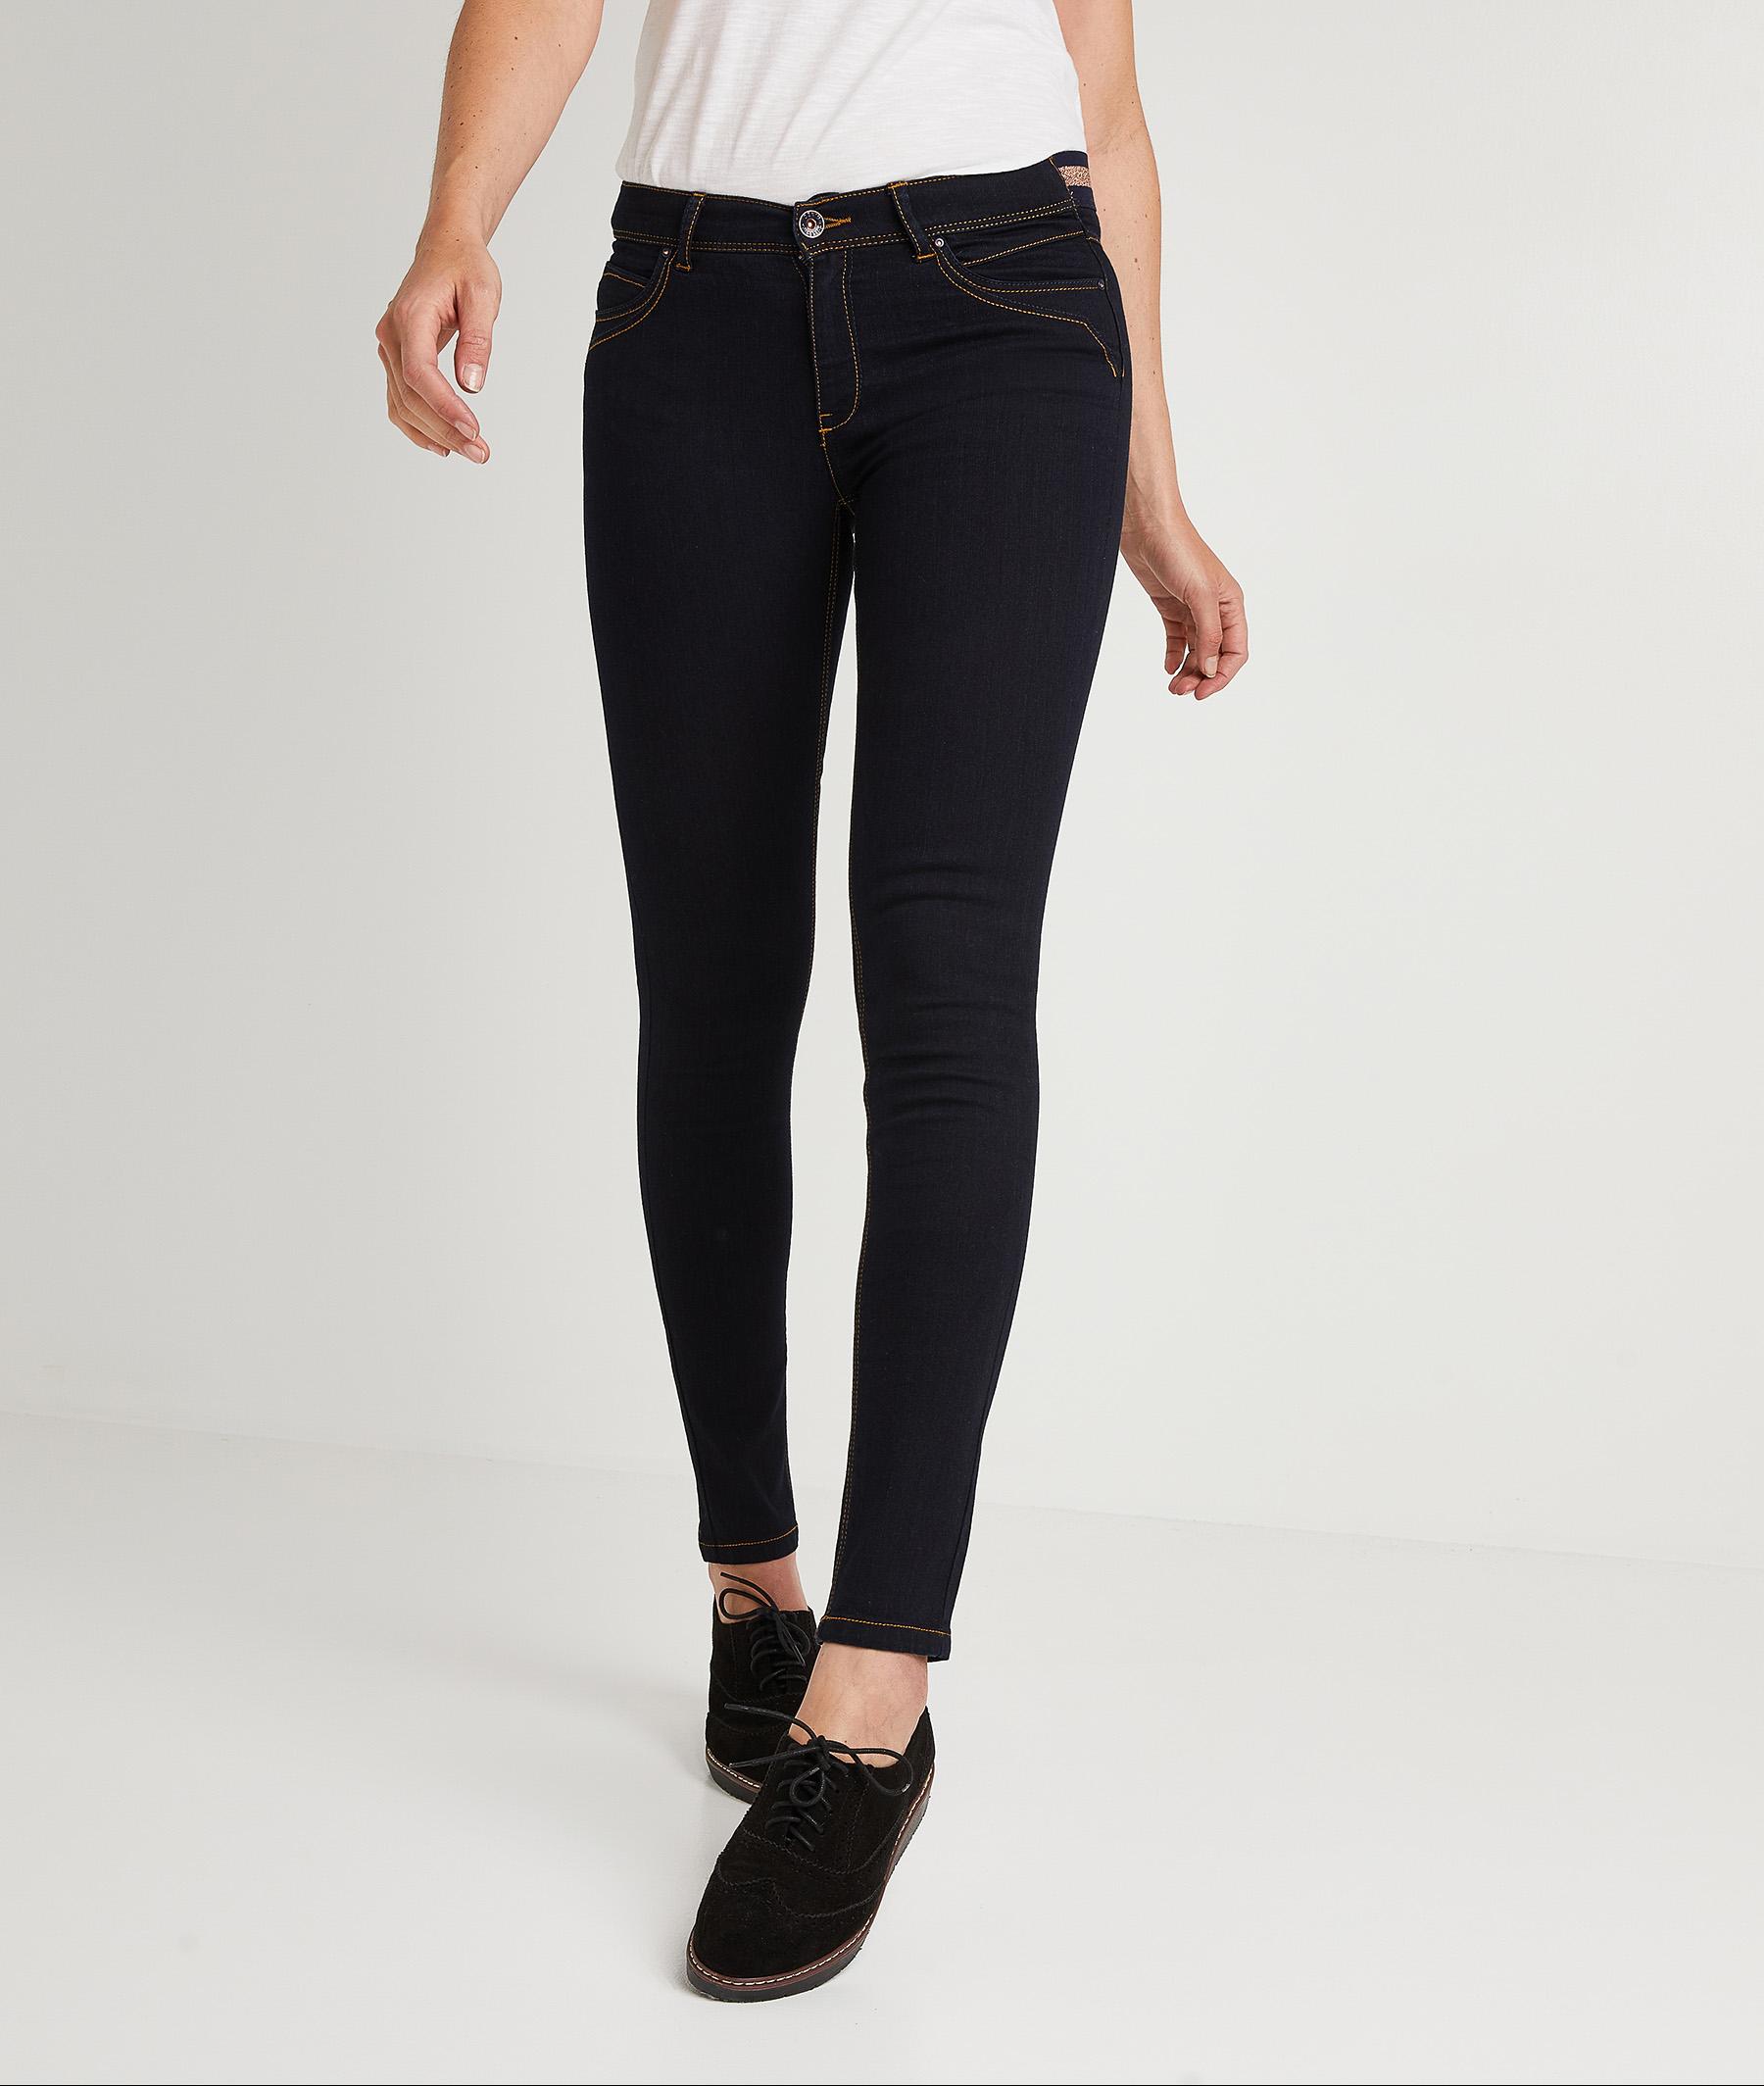 Pantalon jegging femme BLUE BLACK